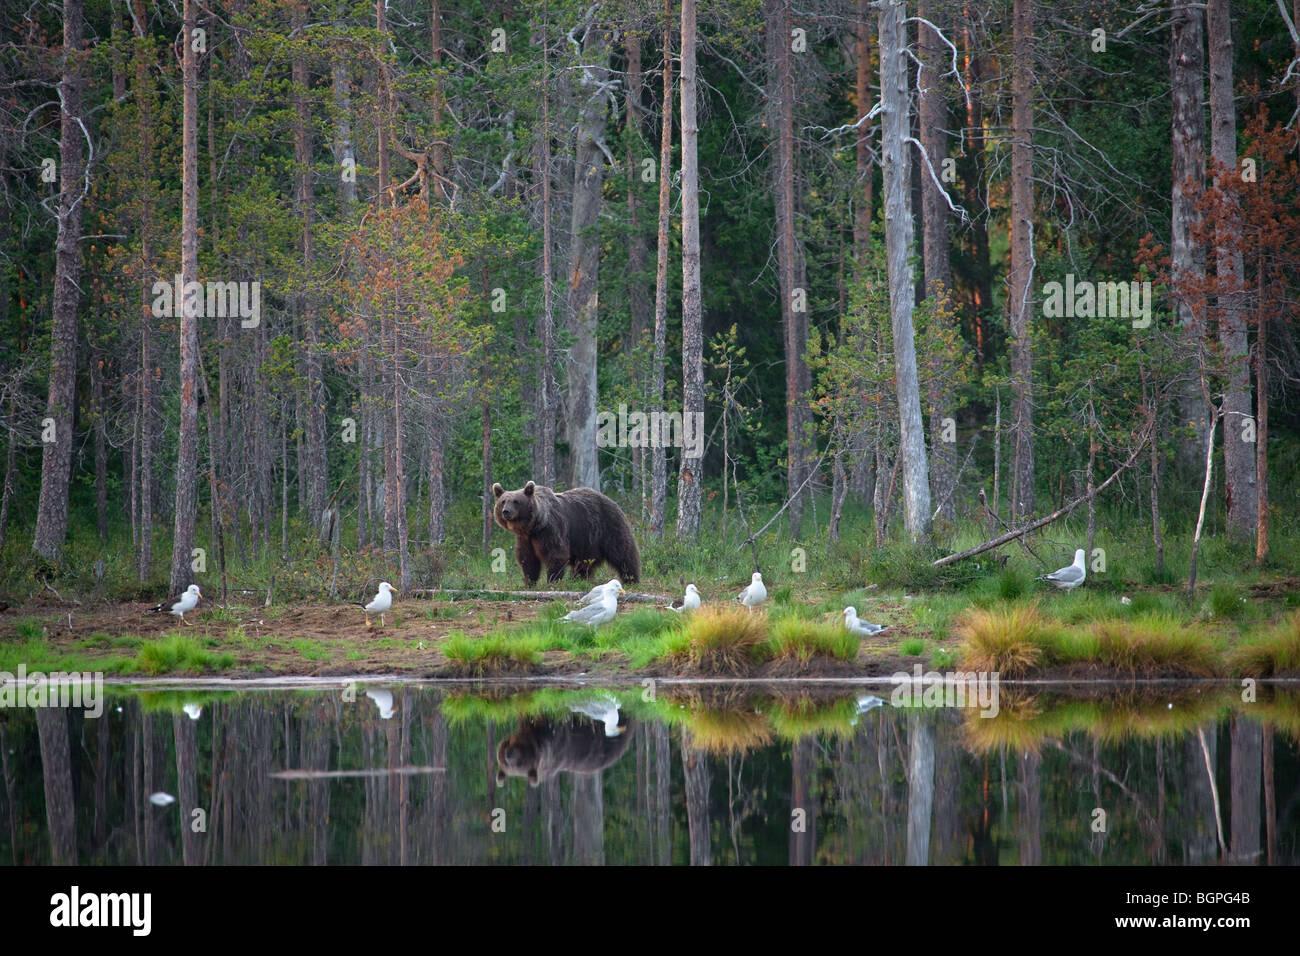 Brown bear (Ursus arctos) foraging along pond in the taiga, Karelien, Finland, Scandinavia - Stock Image